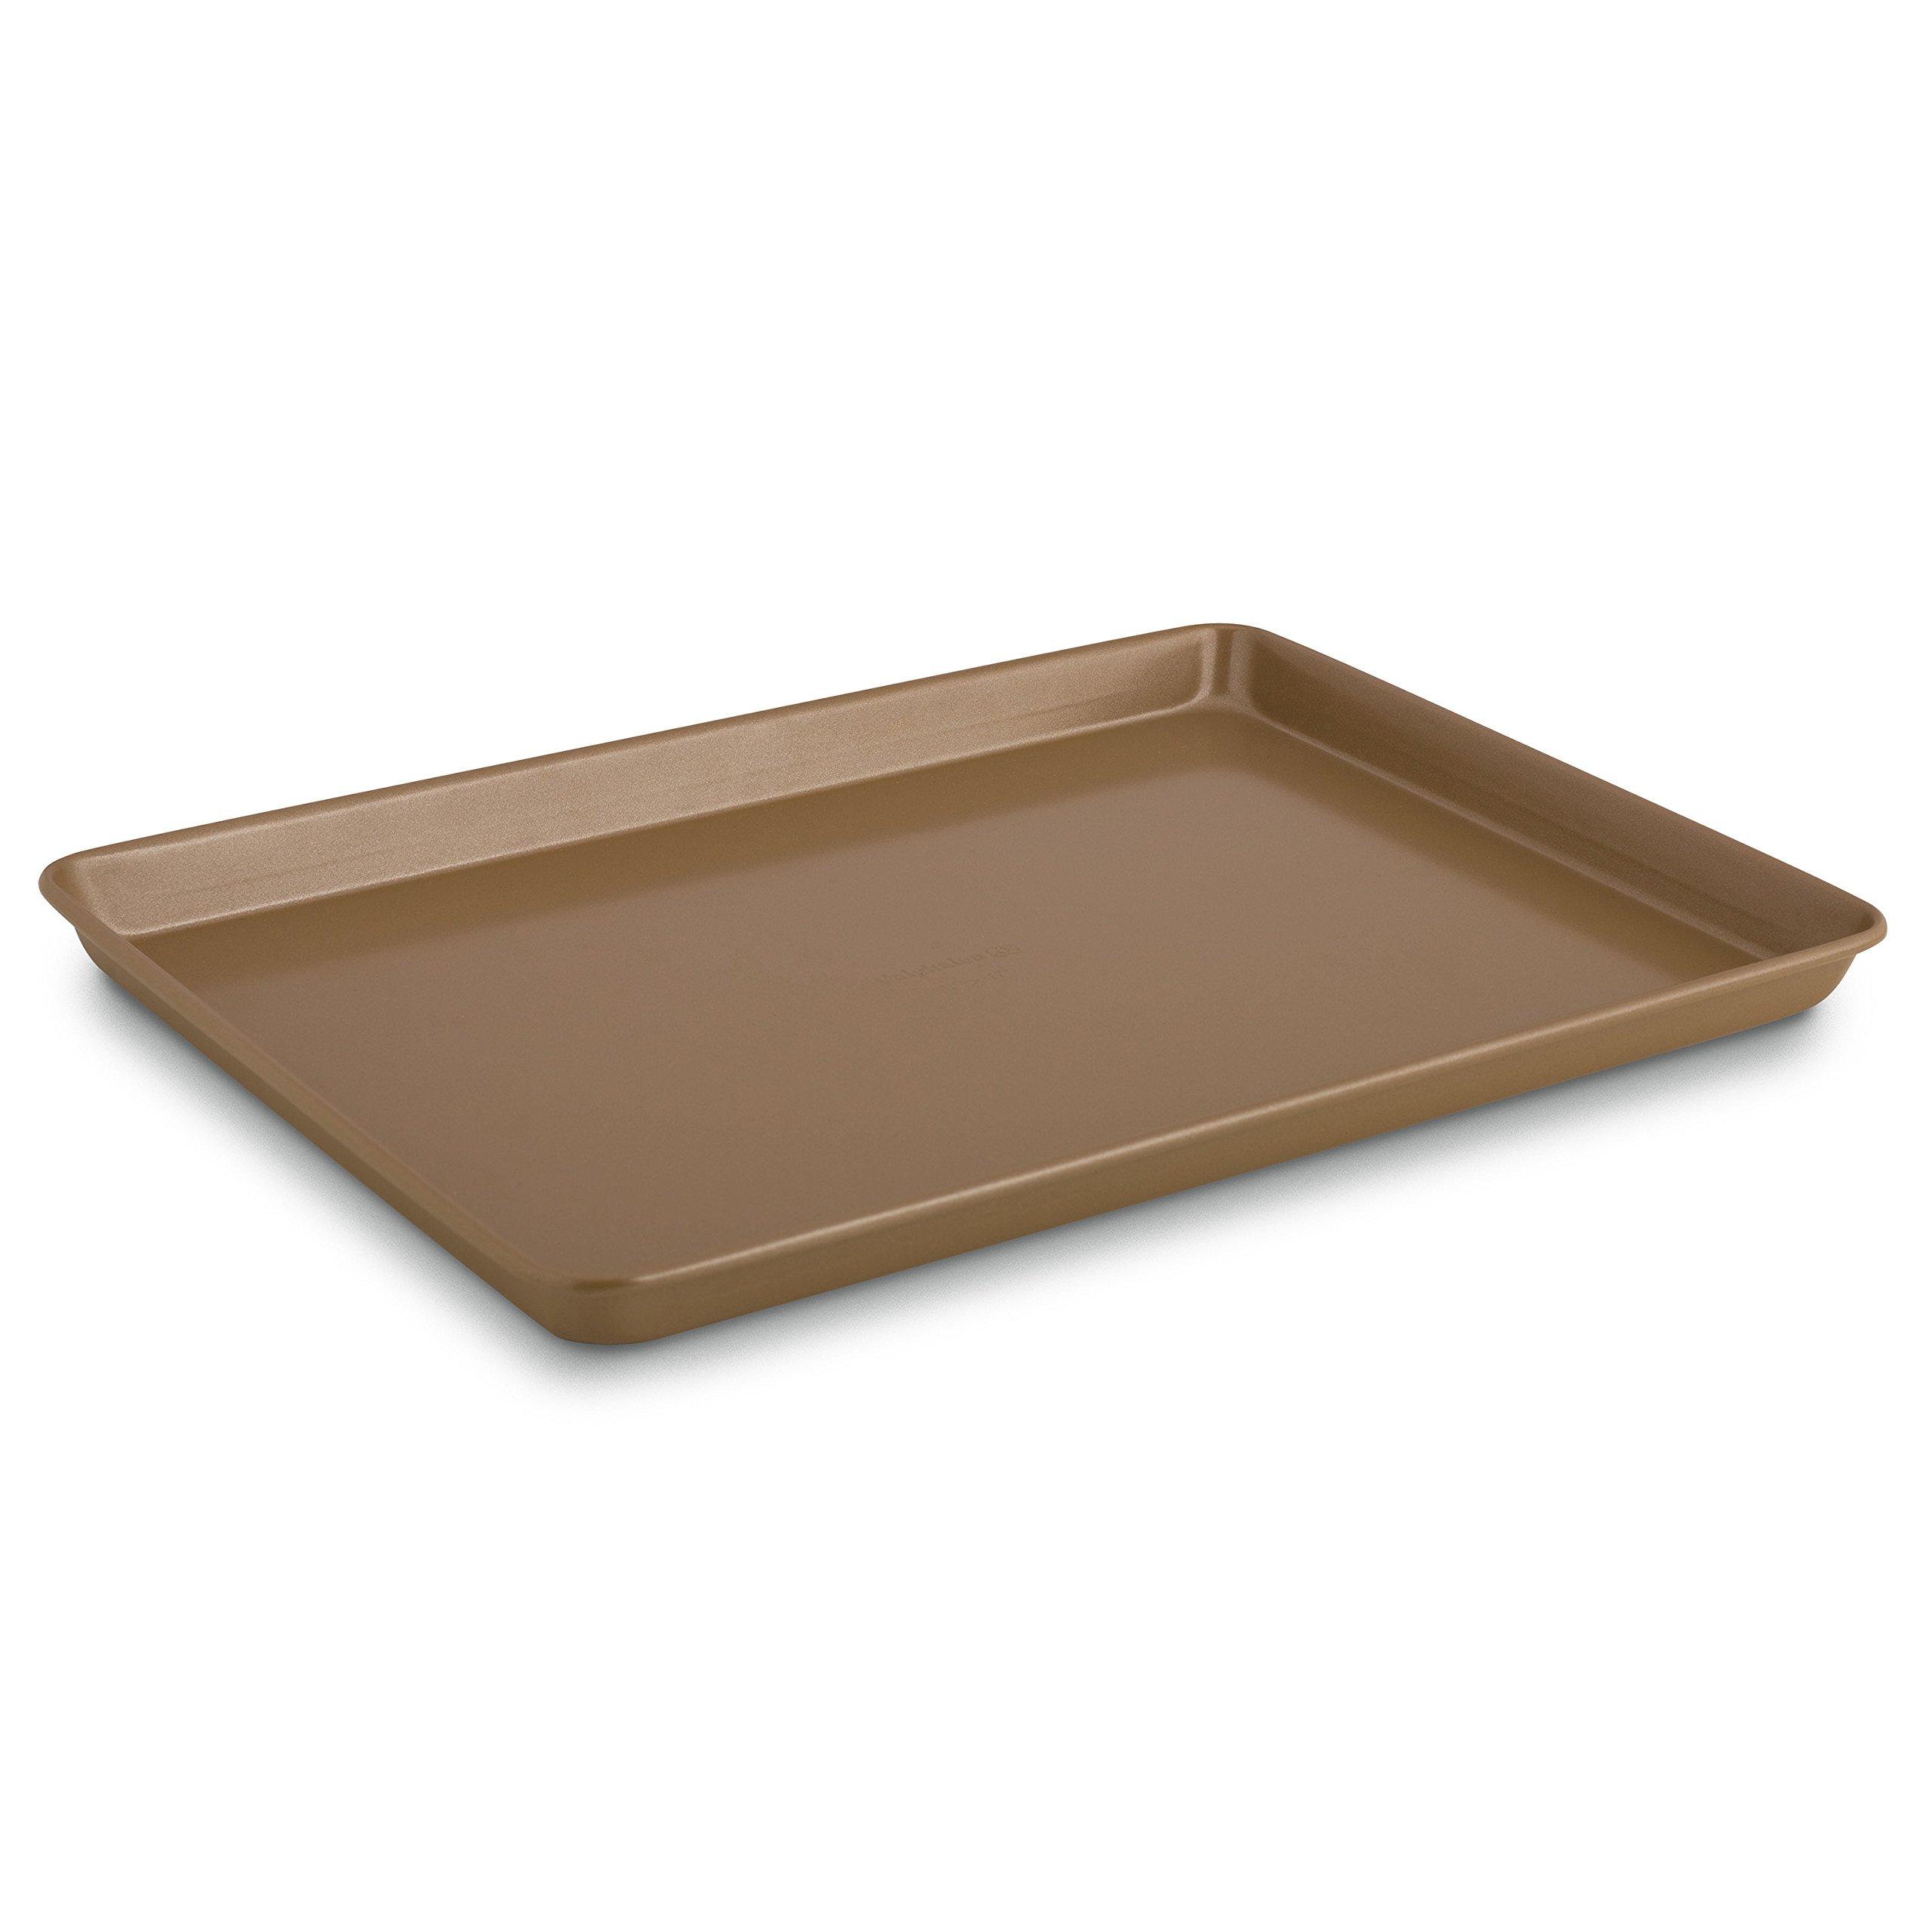 Simply Calphalon Nonstick Bakeware, Baking Sheet, 12-inch by 17-inch